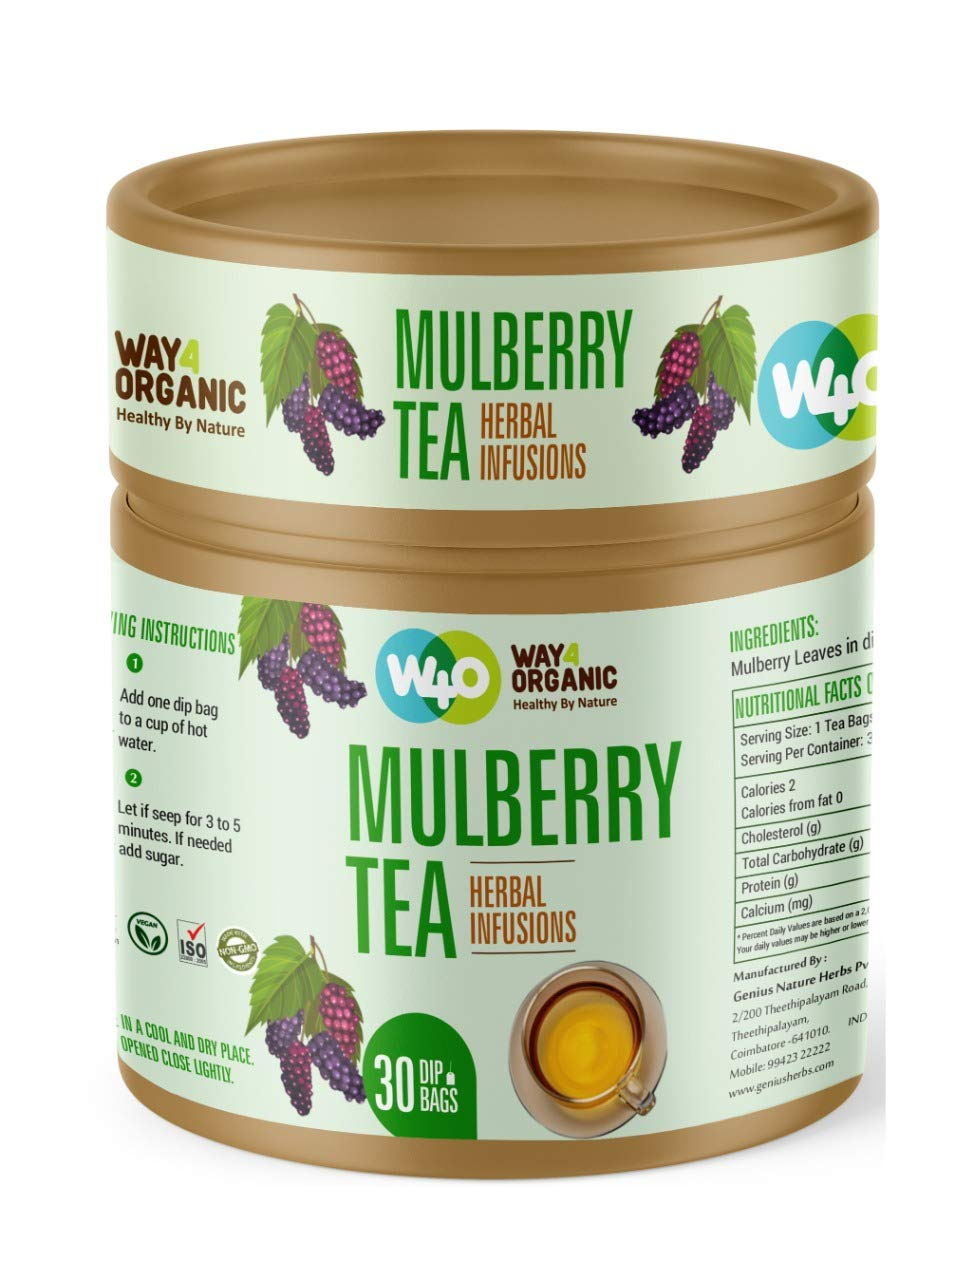 Way4Organic Mulberry Tea in Dip Bags